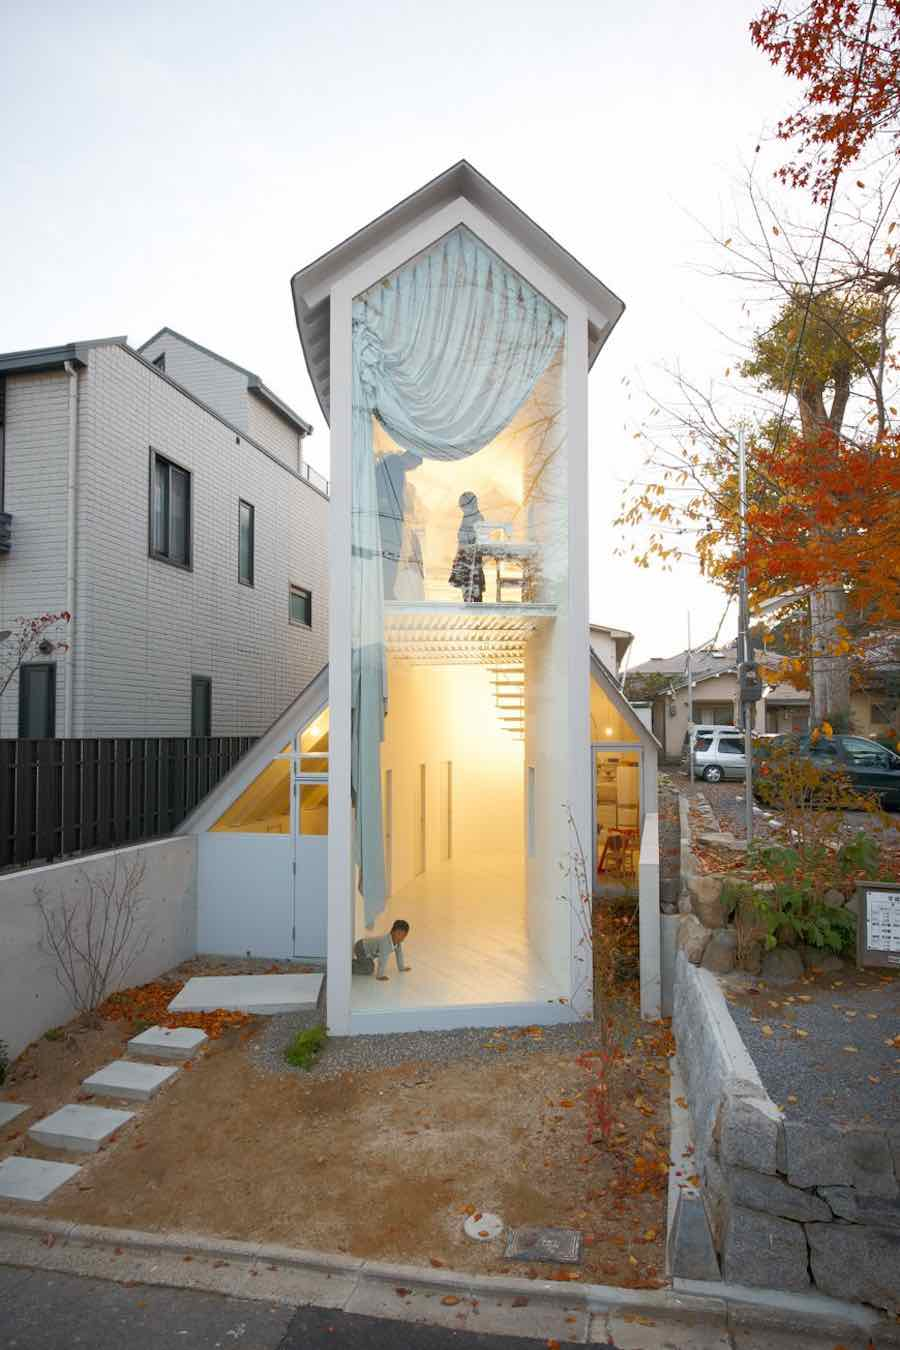 """The Japanese House Architecture and Life after 1945"" Hideyuki Nakayama, O House, 2009 © Mitsutaka Kitamura."